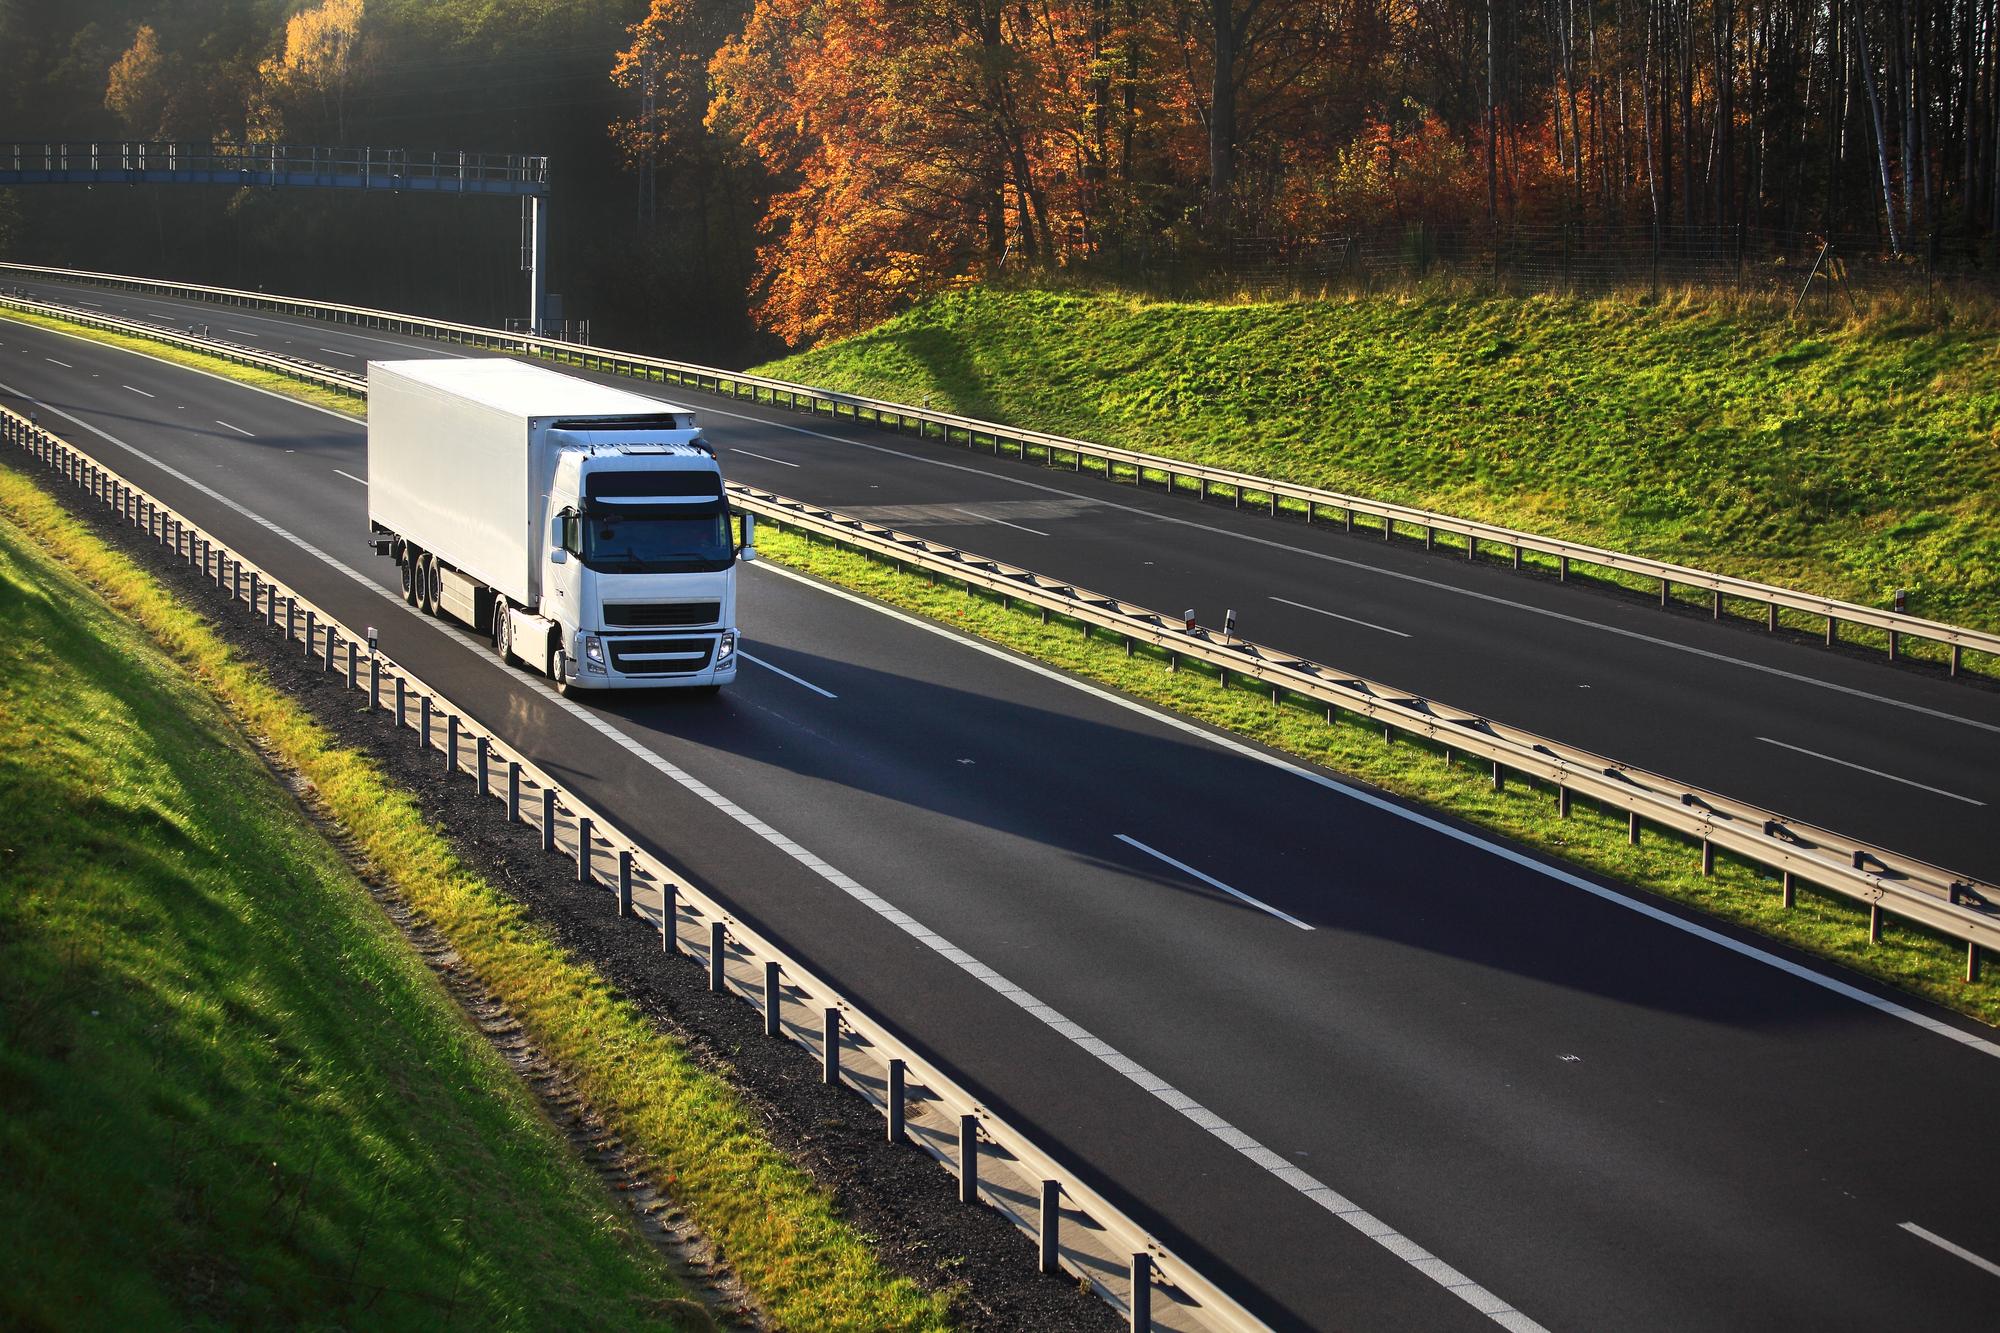 A semi truck driving along a highway